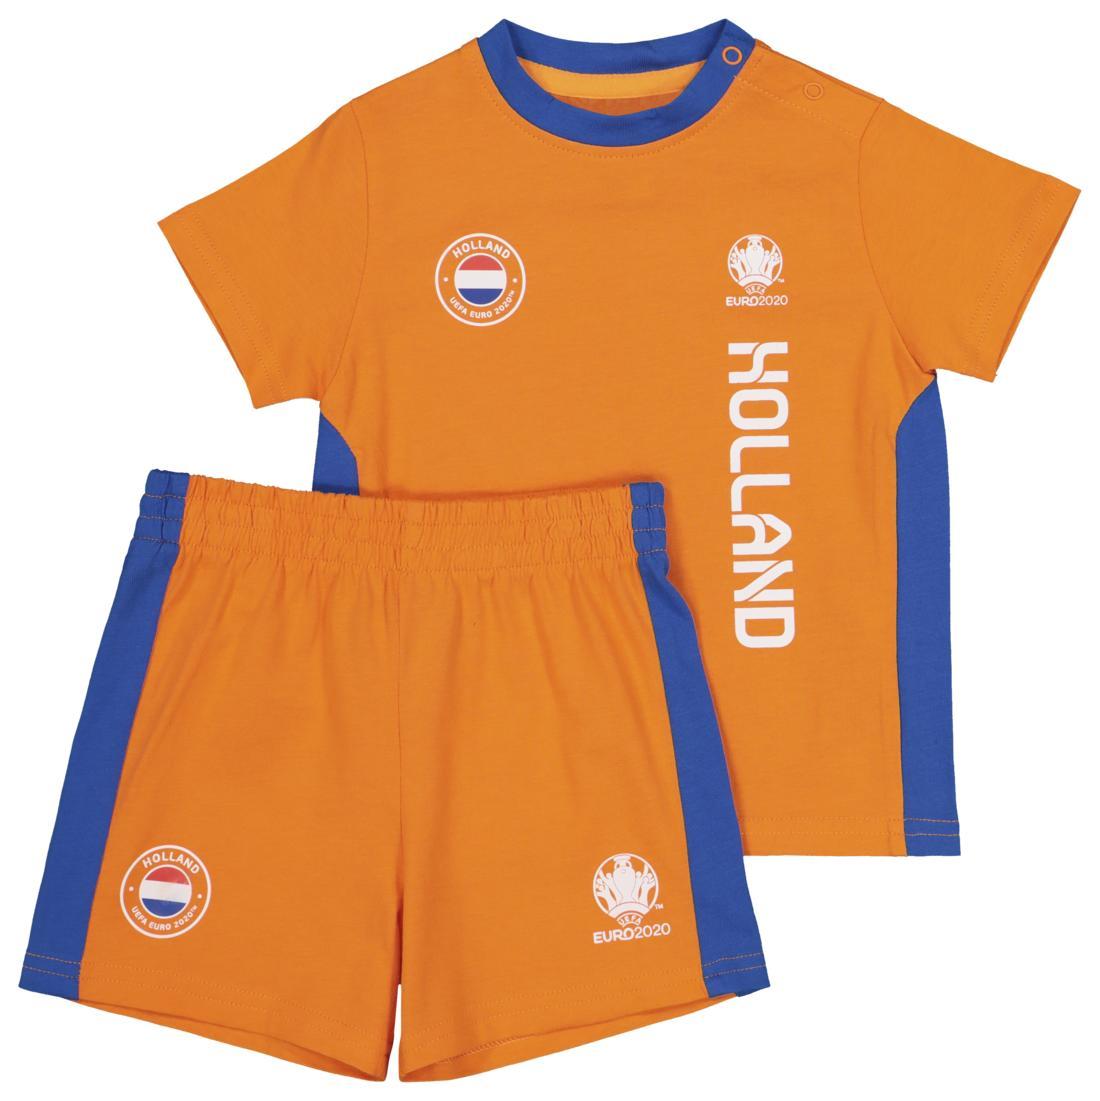 Babypakje oranje | Tips voor EK 2021 kinderen